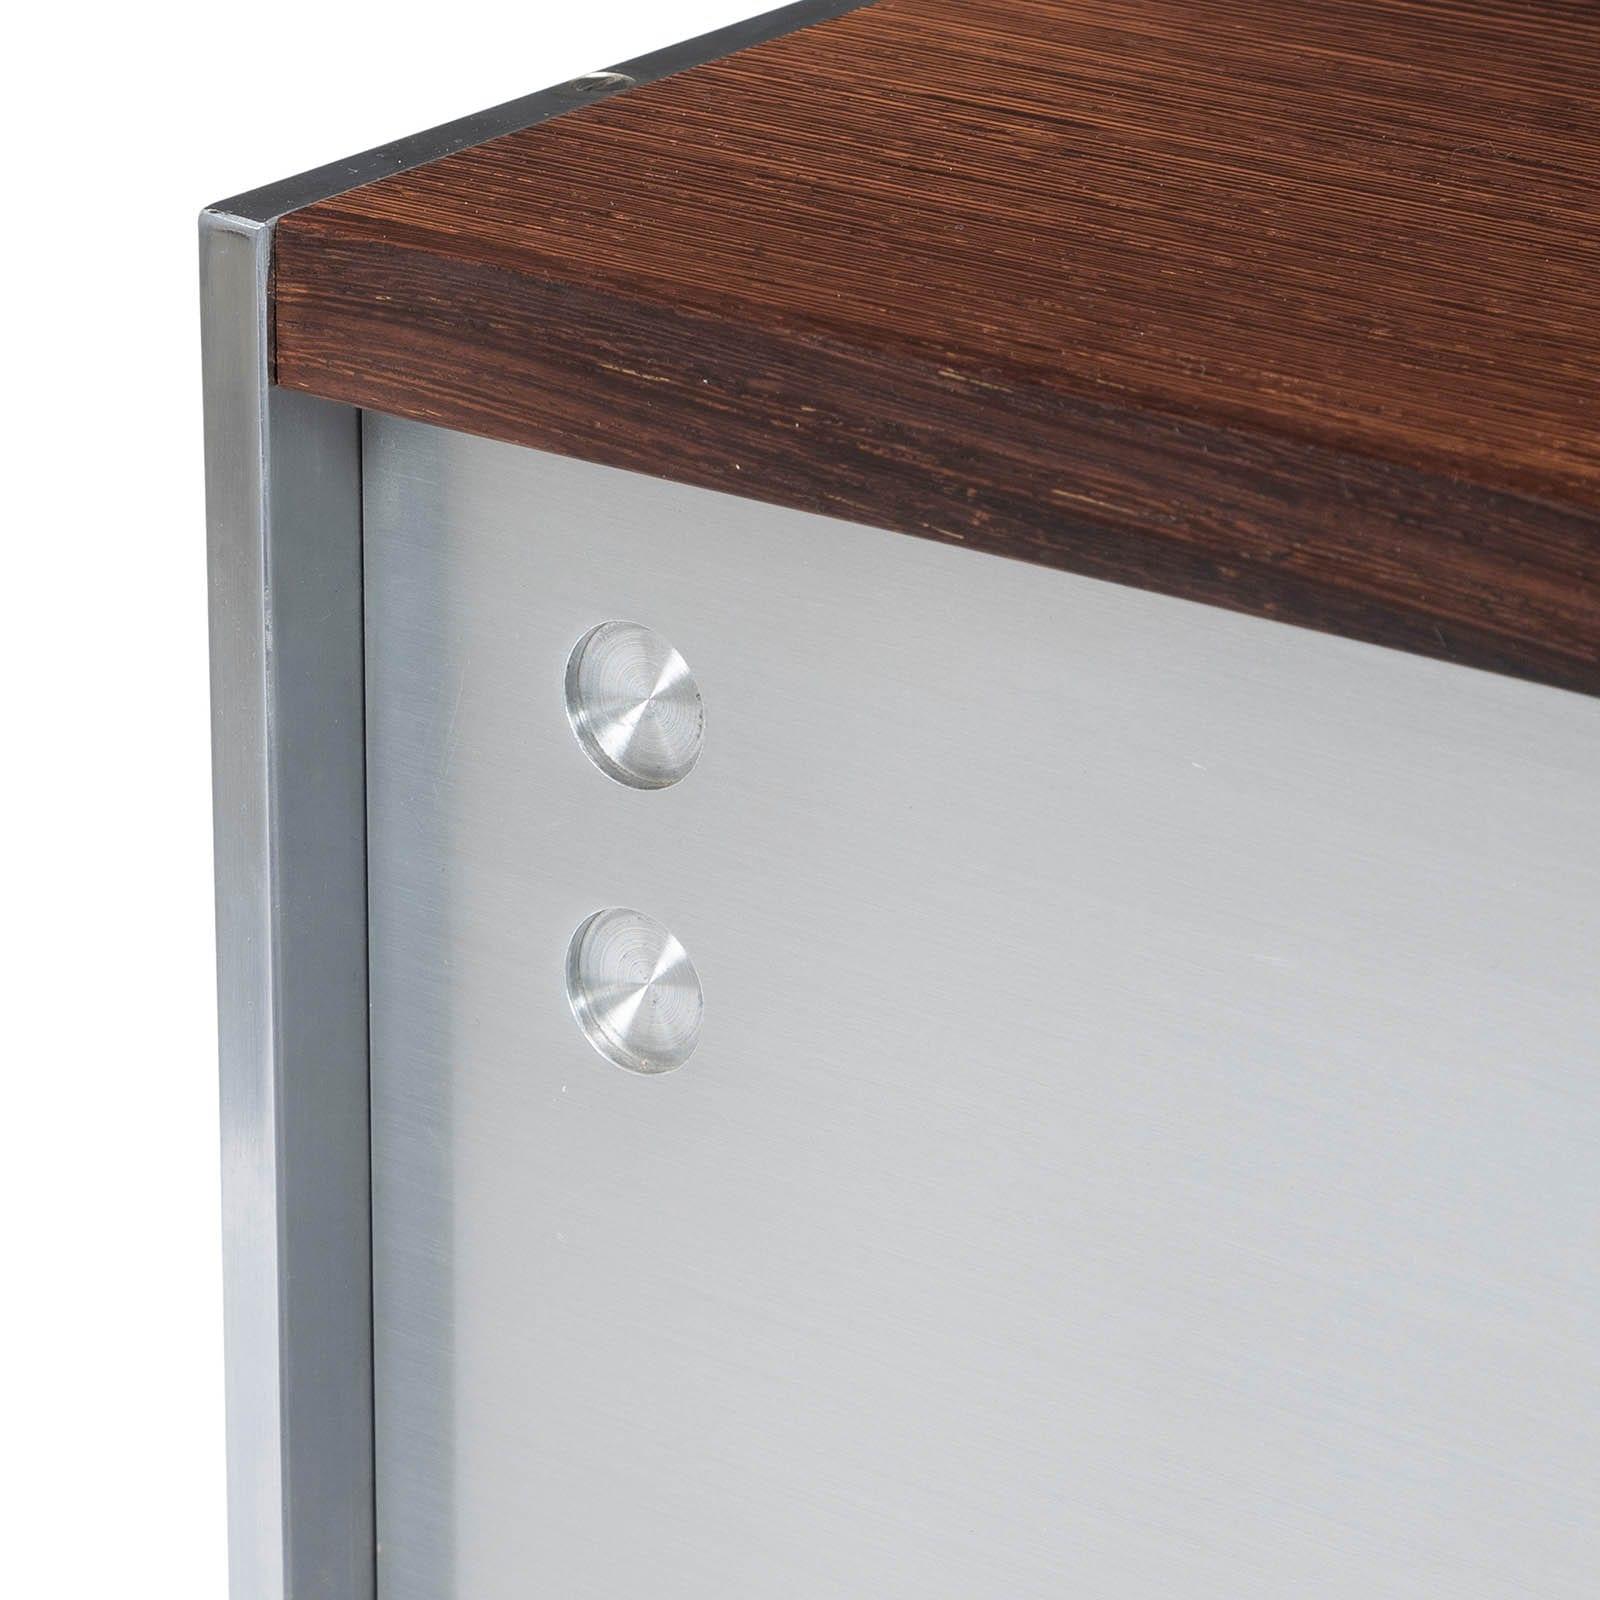 A sideboard